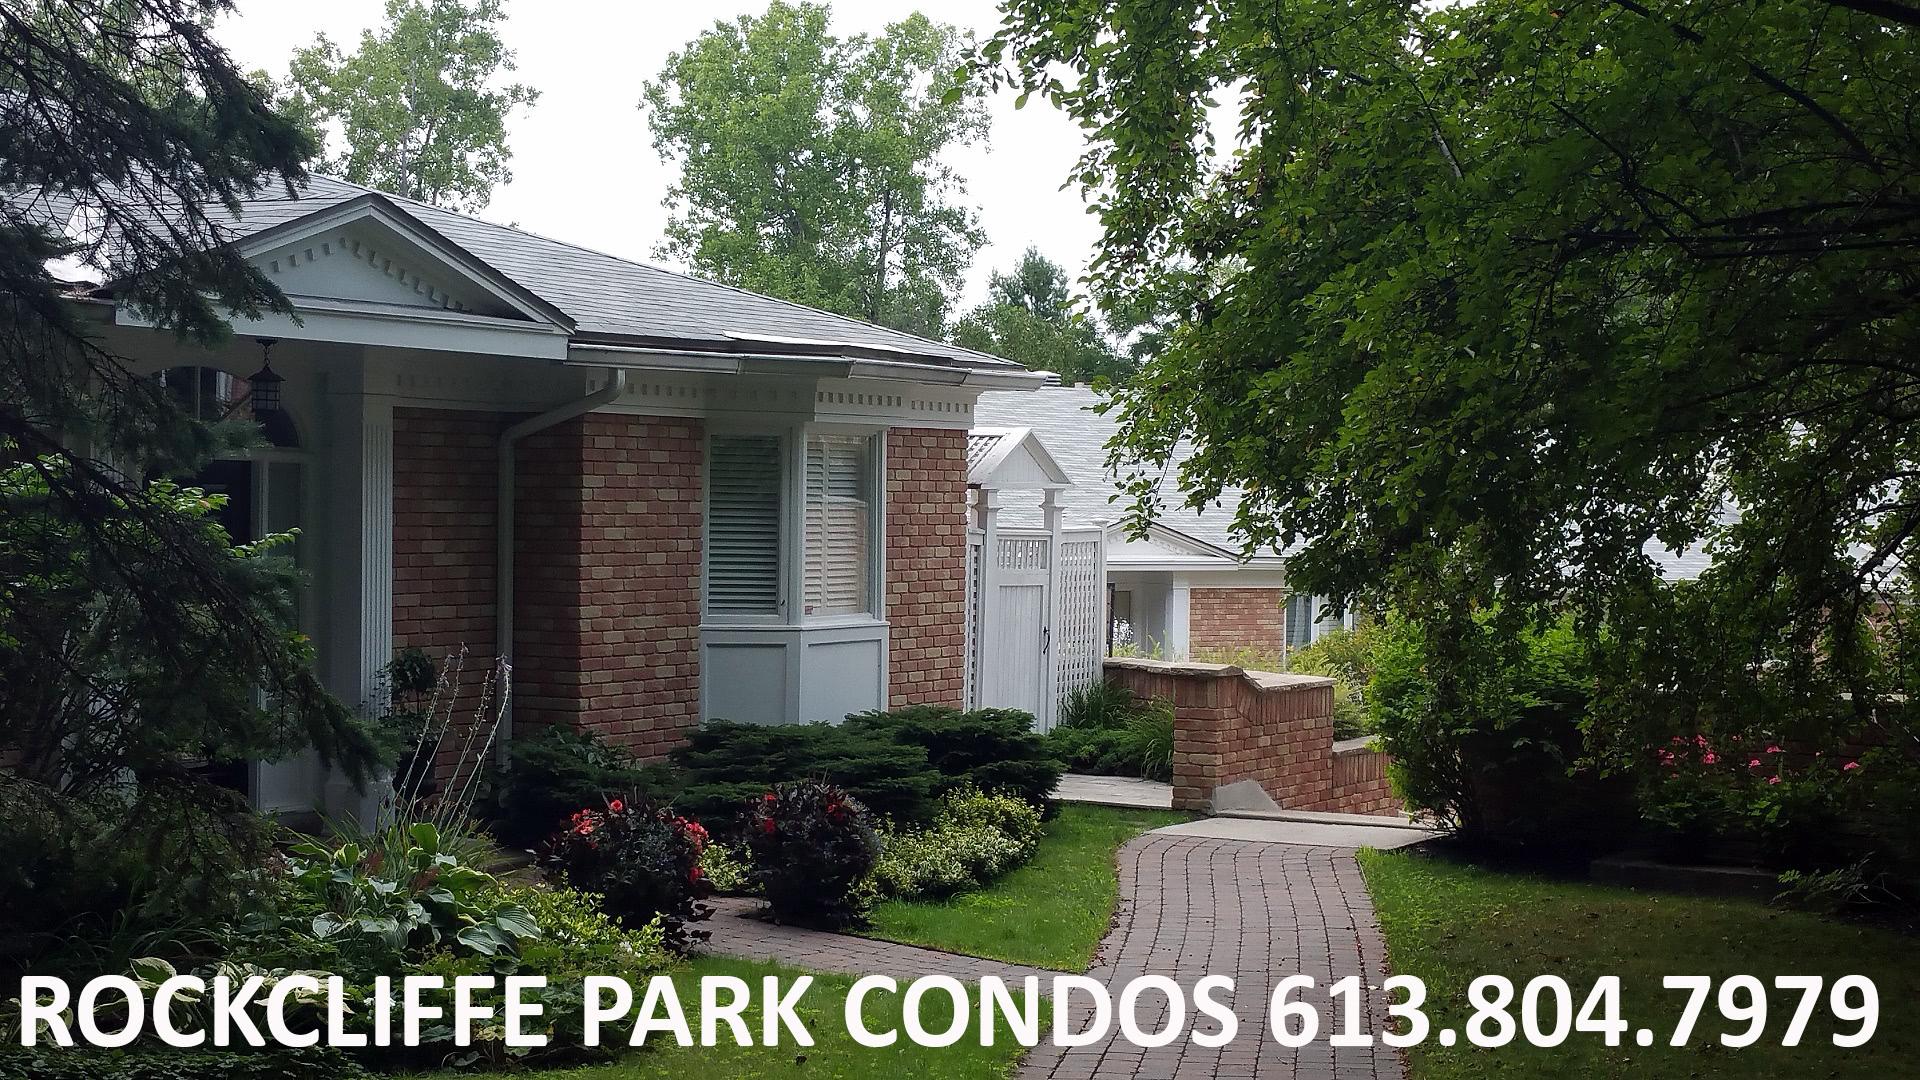 Ottawa condos for sale rockcliffe park 55 to 65 whitemarl drive solutioingenieria Gallery